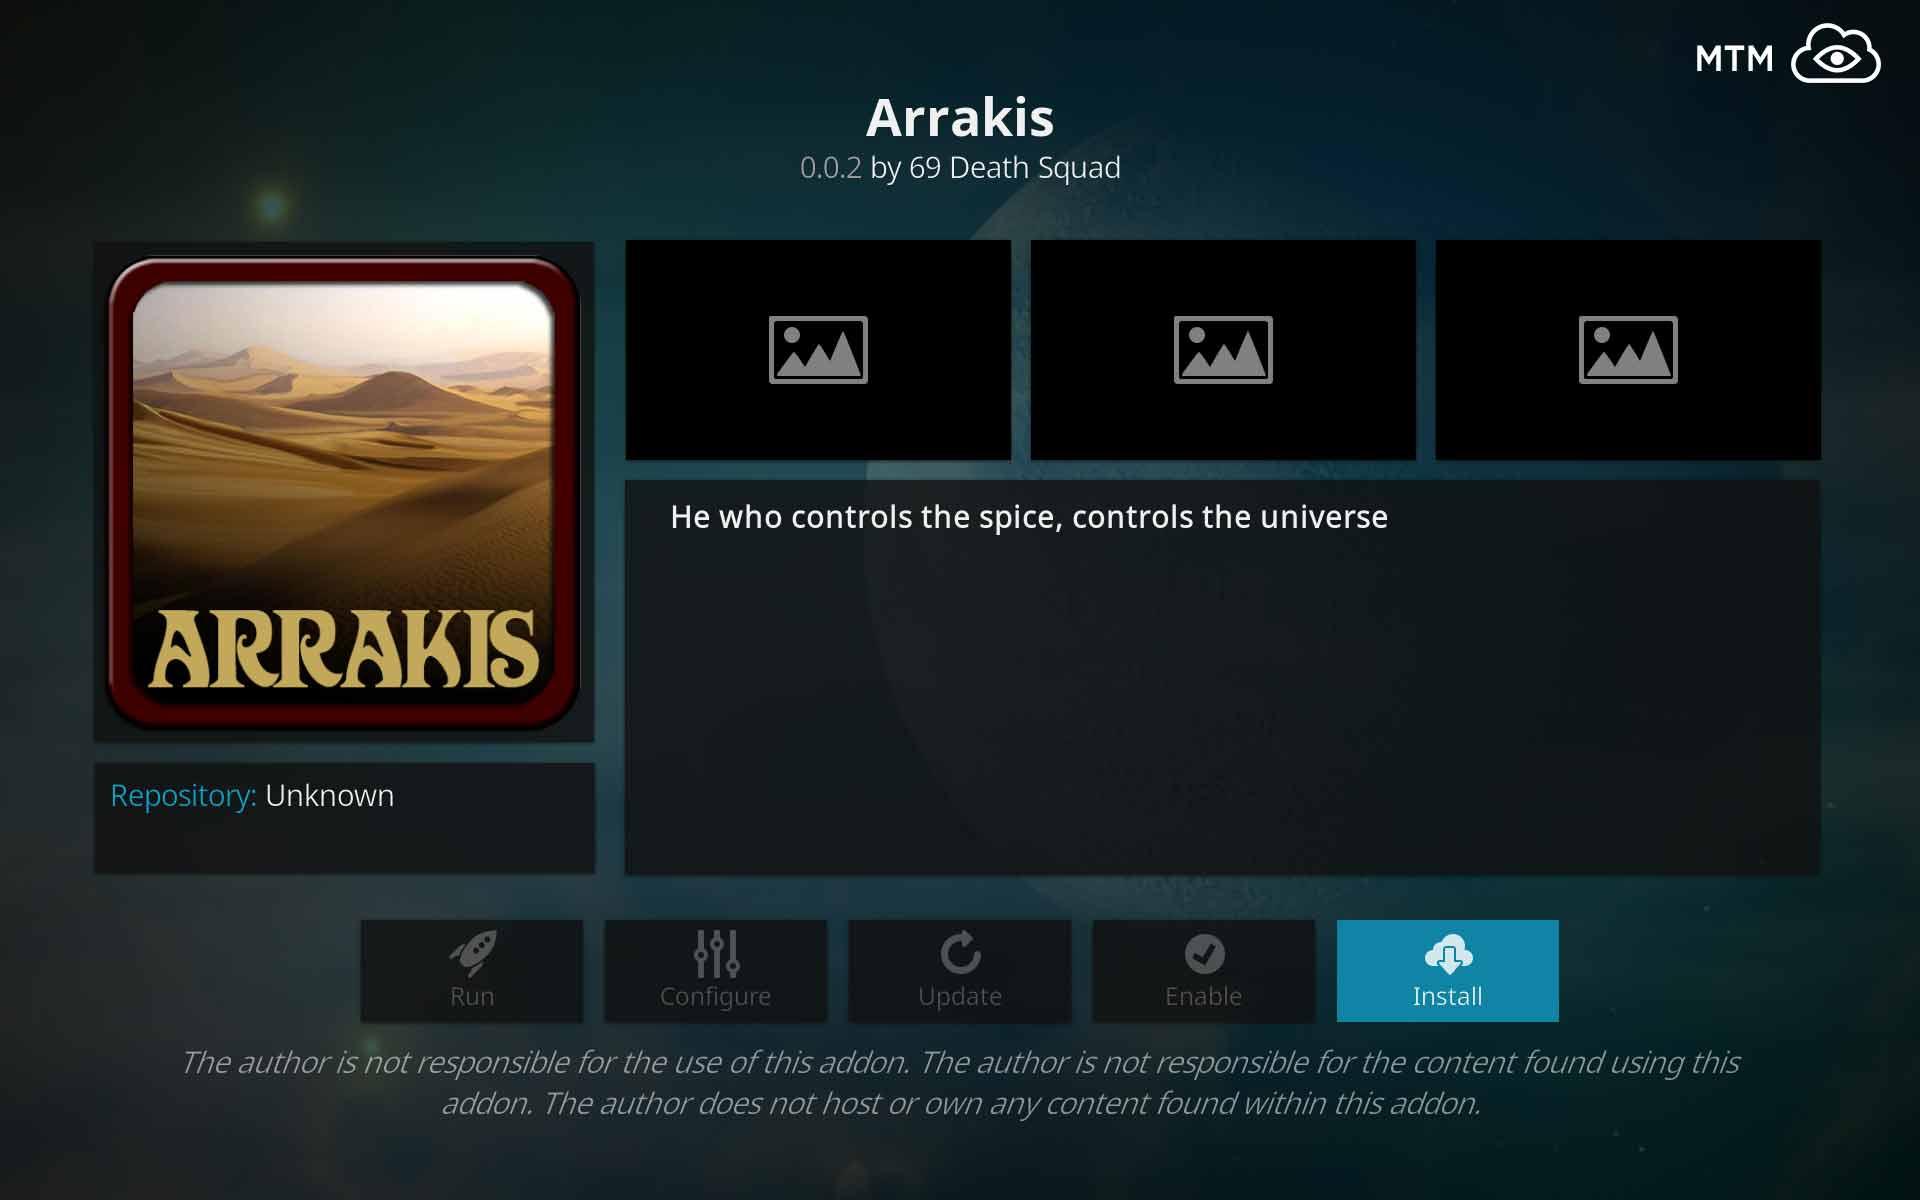 How to Install Arrakis Kodi All-in-One Addon from Blamo Repo